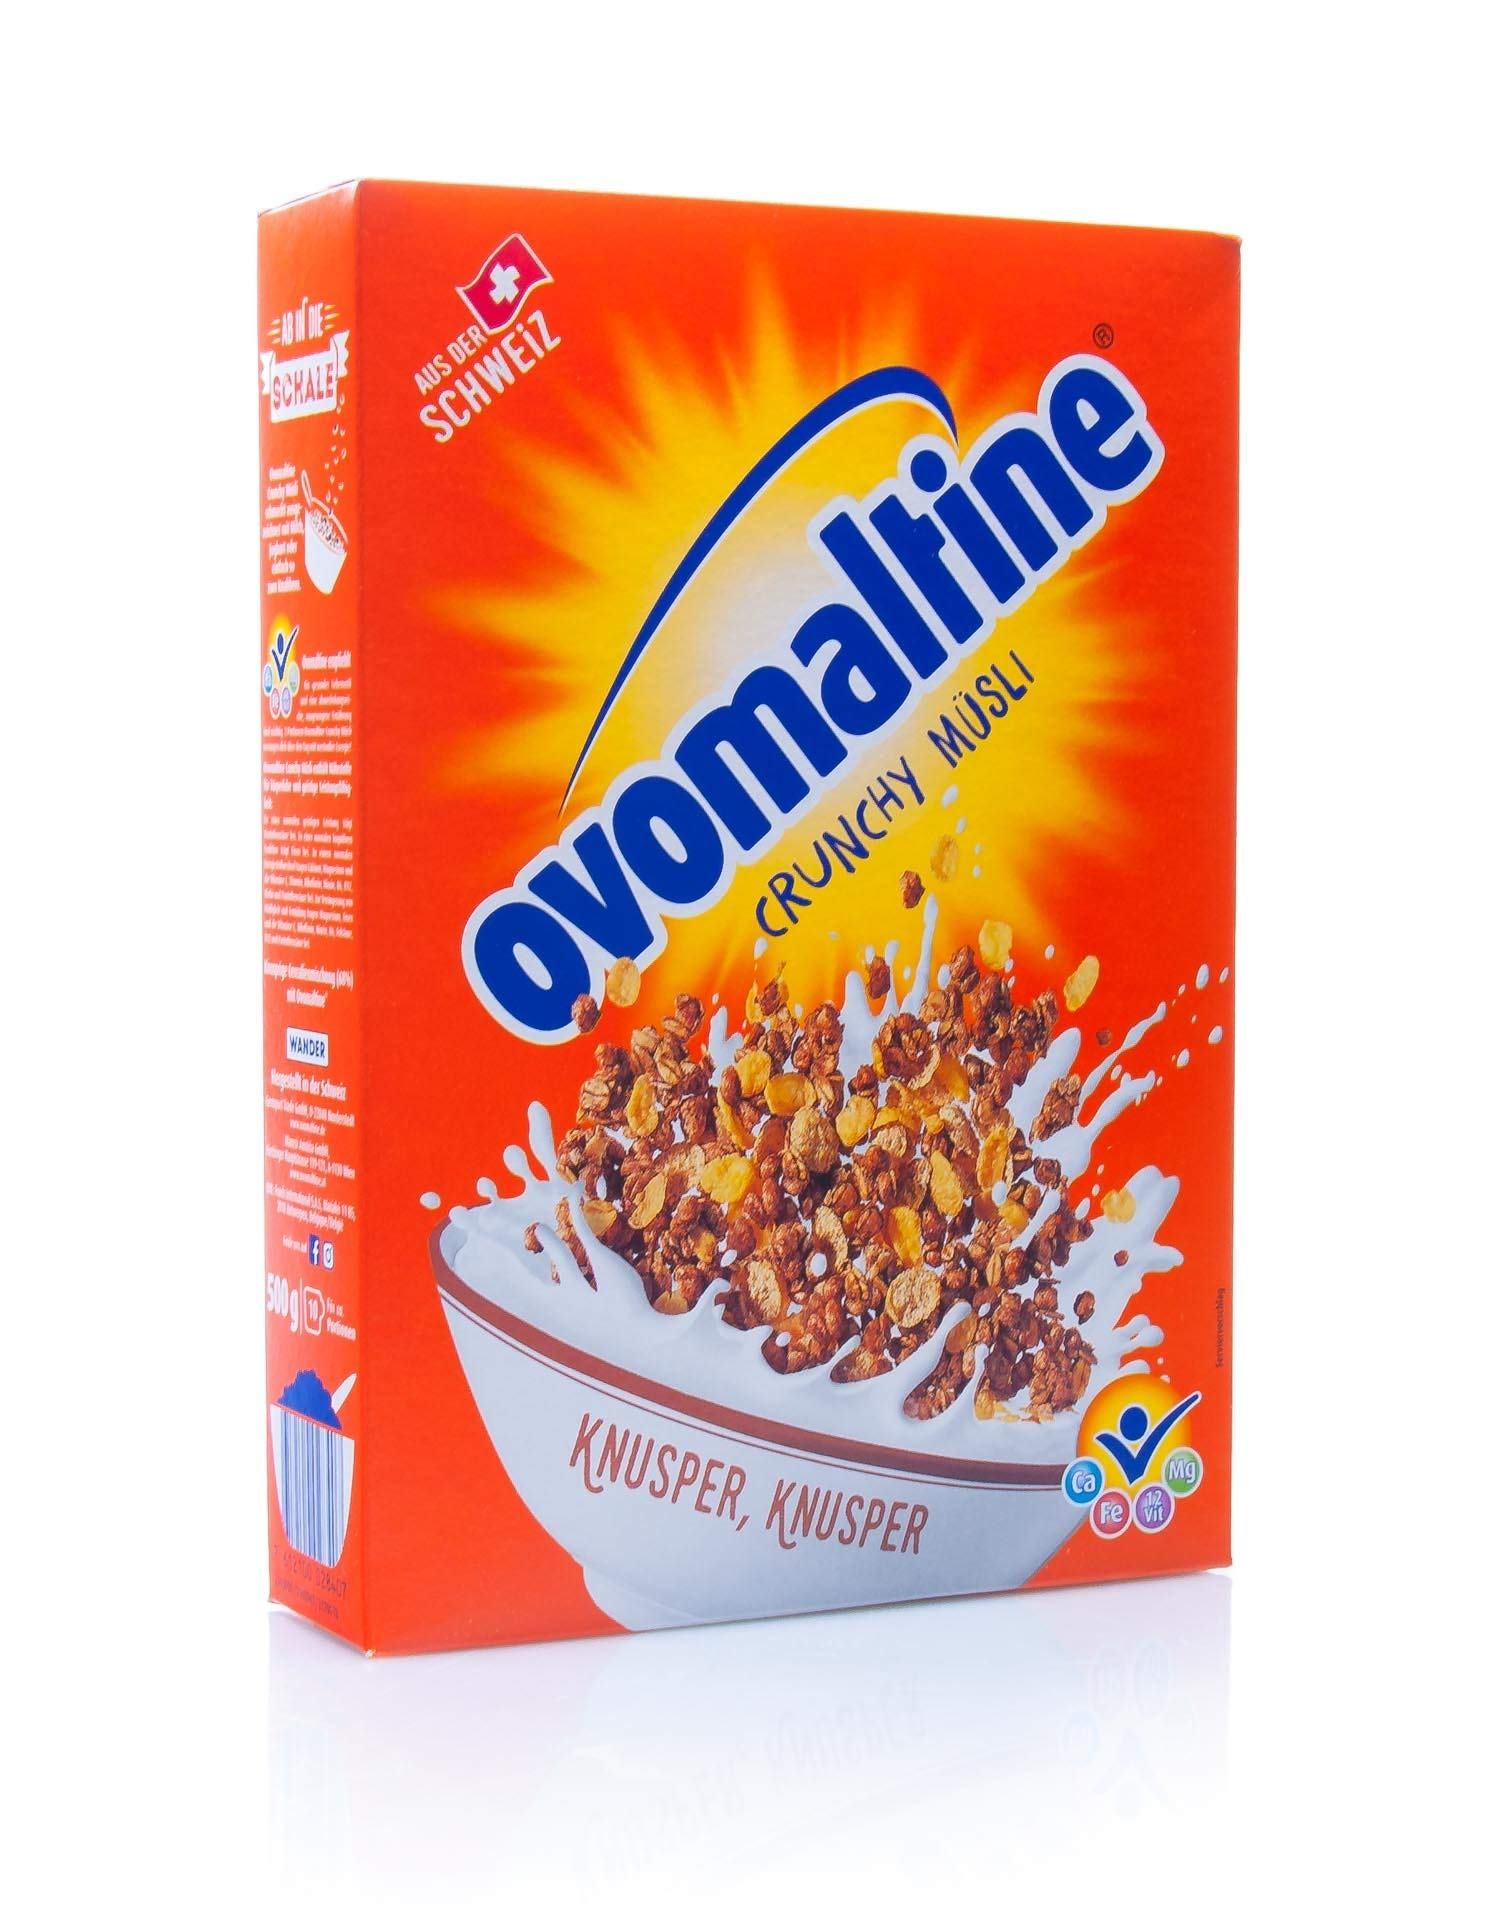 Ovomaltine Crisp cereals, cereal mixed with Ovaltine - 500g